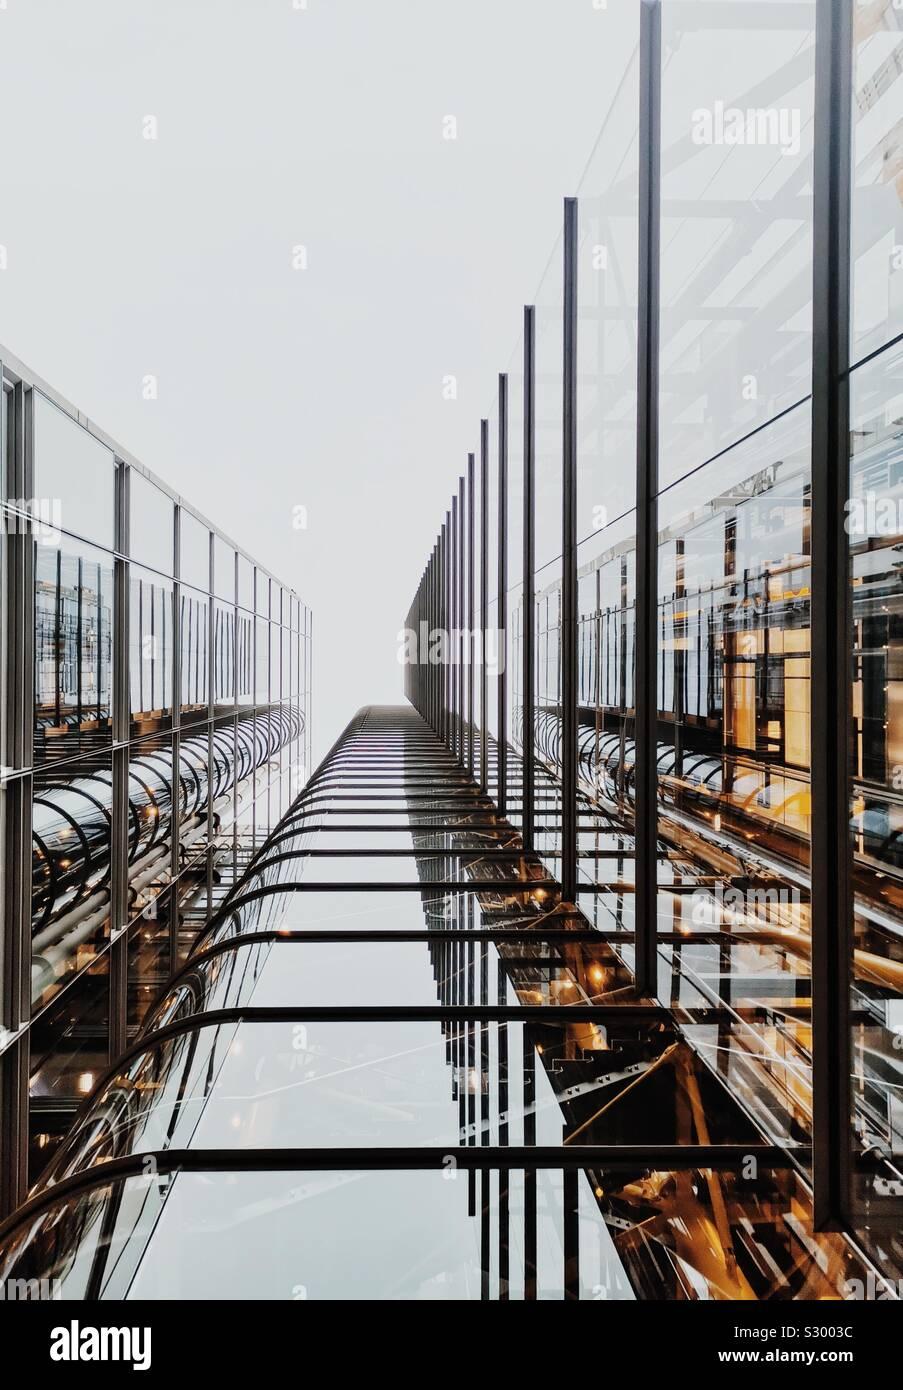 London-Architektur Stockfoto